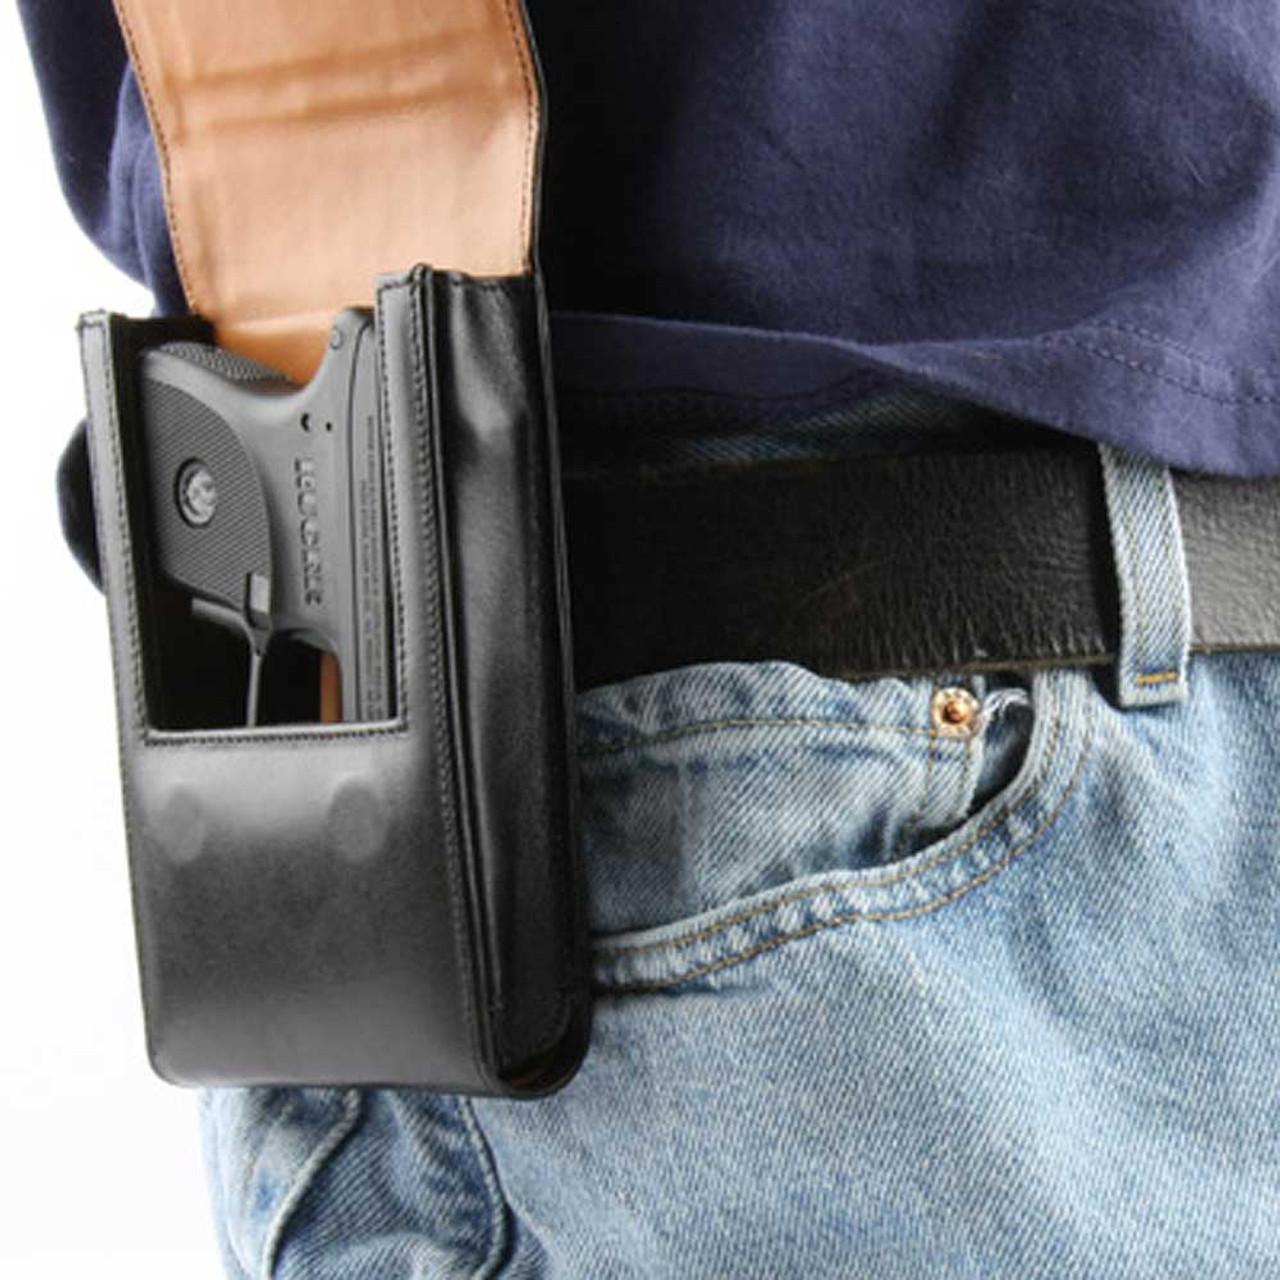 S&W Bodyguard 380 Sneaky Pete Holster (Belt Clip)